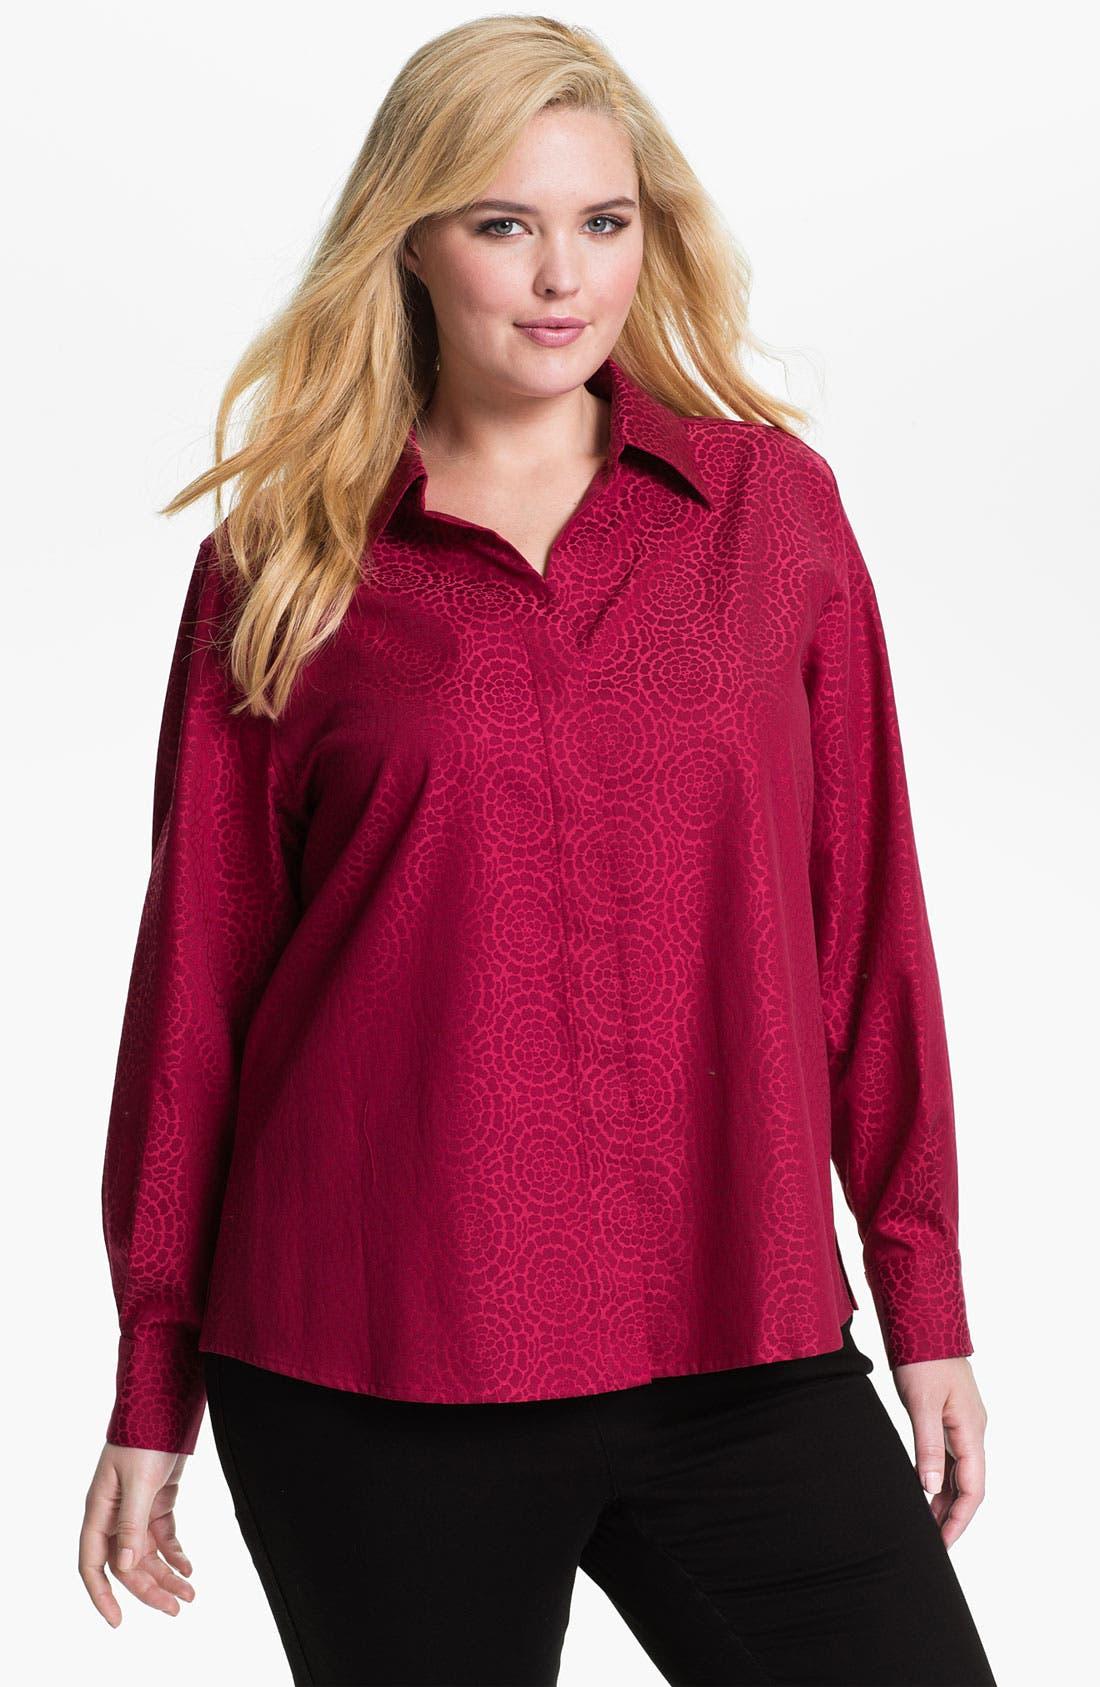 Alternate Image 1 Selected - Foxcroft 'Chrysanthemum' Wrinkle Free Shaped Shirt (Plus)